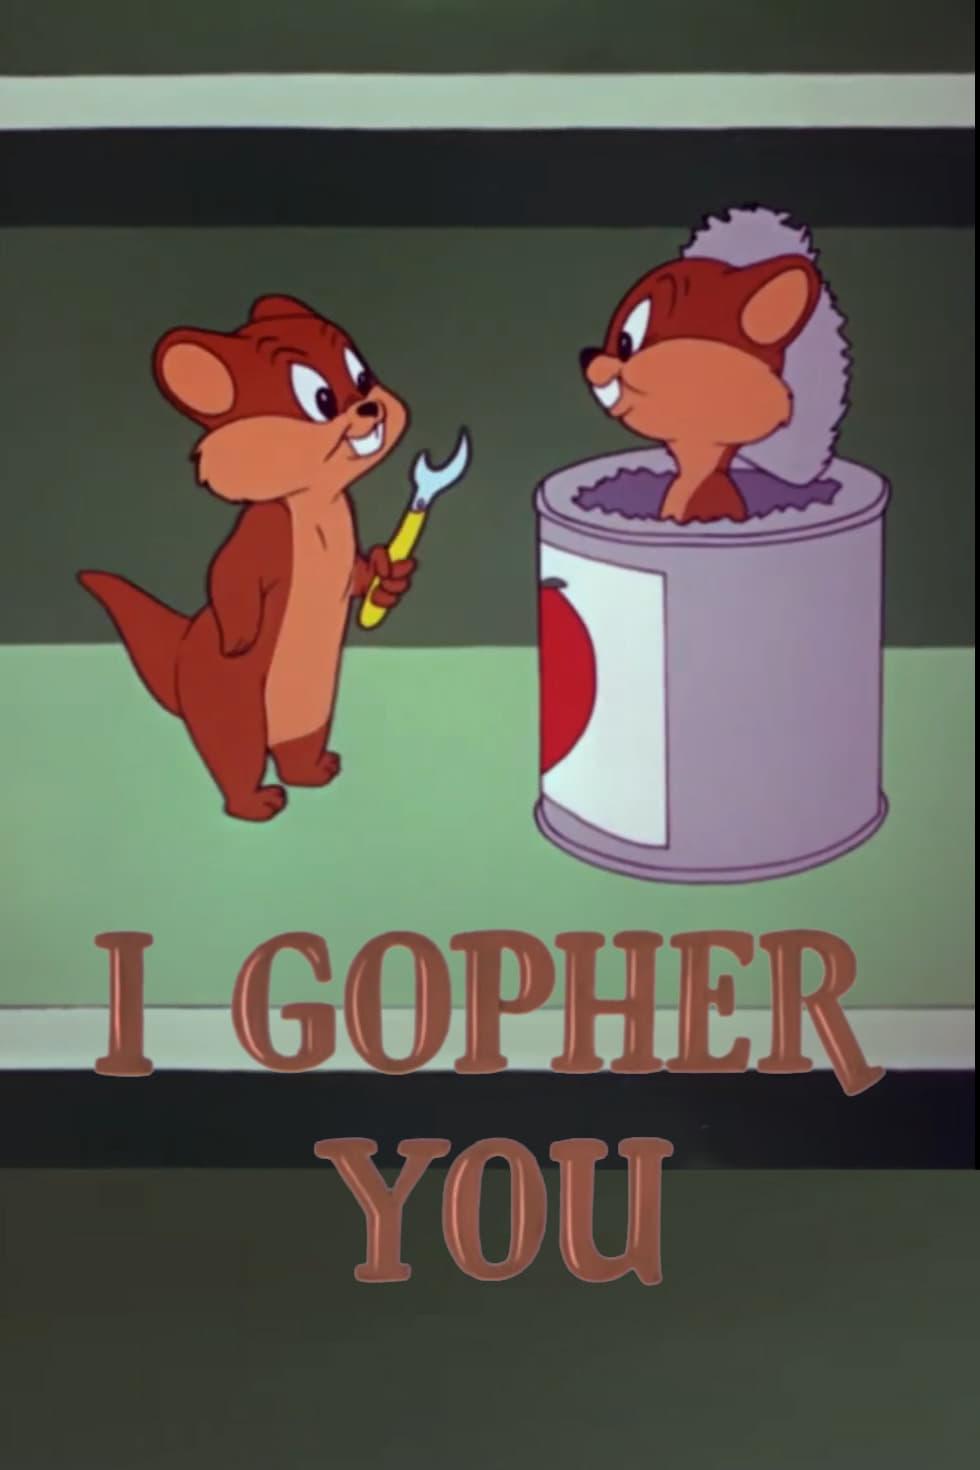 I Gopher You